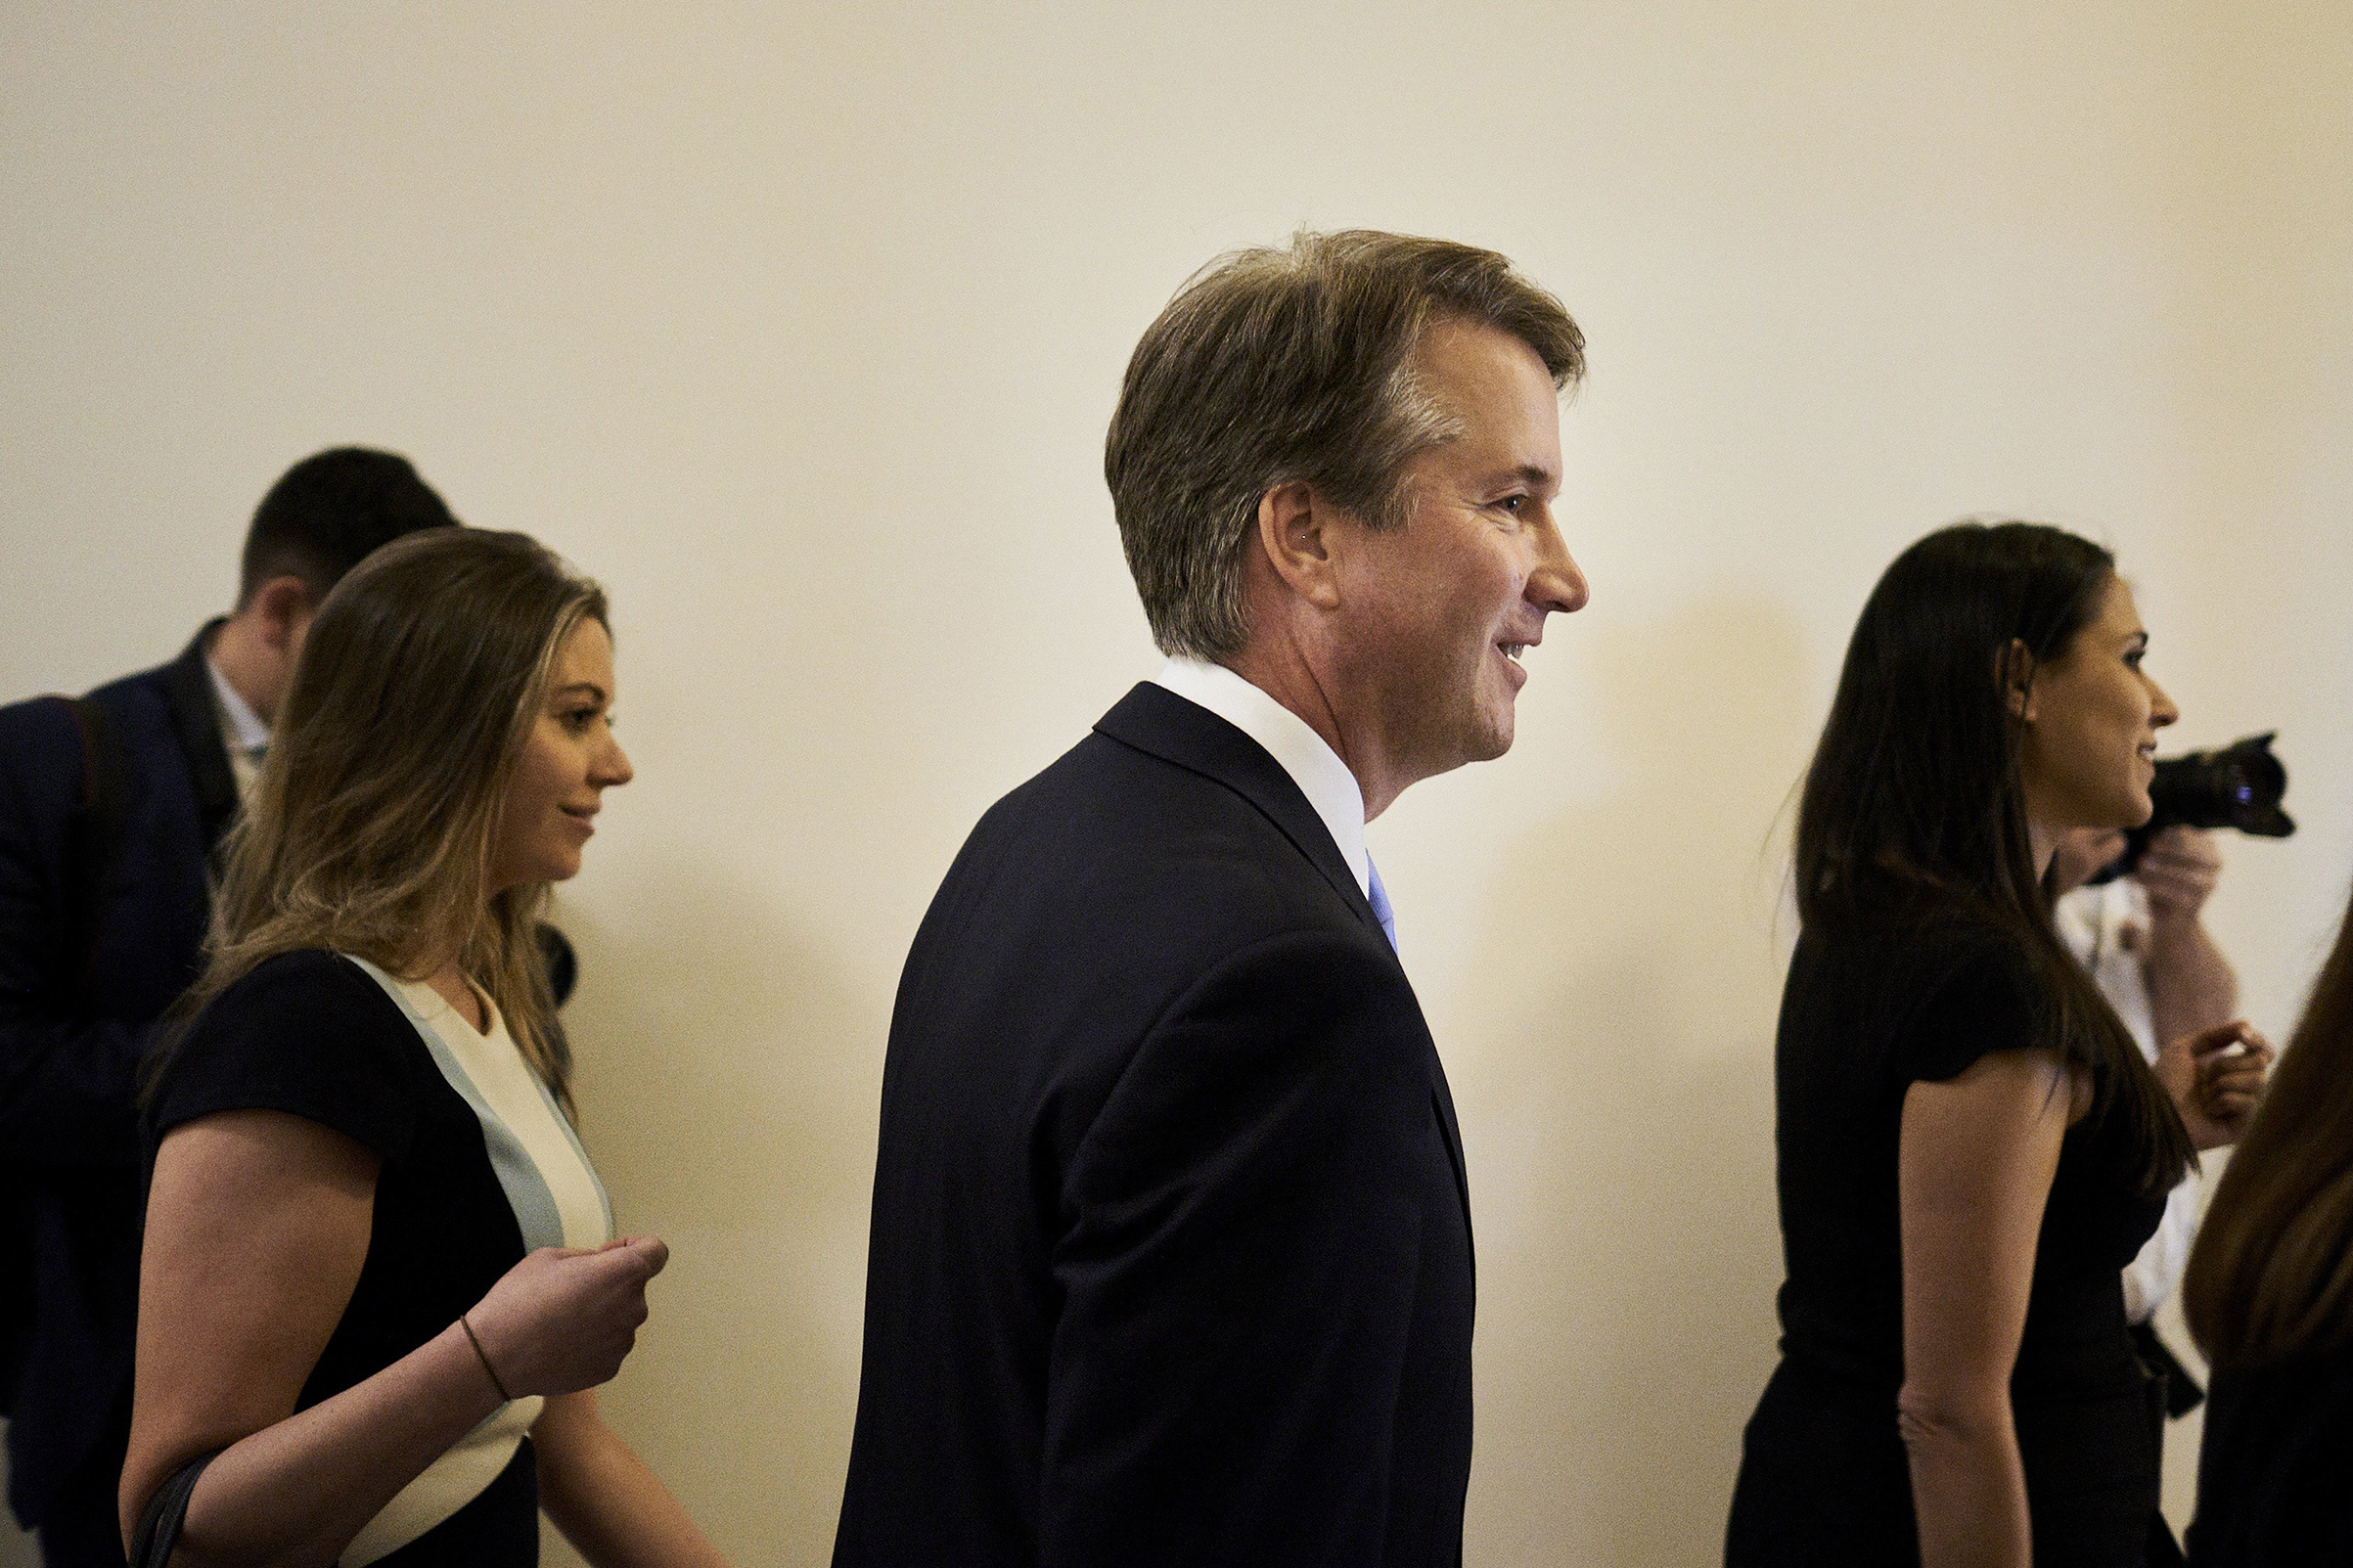 Brett Kavanaugh arrives at the Russell Senate Office Building in Washington                    onJuly 12.